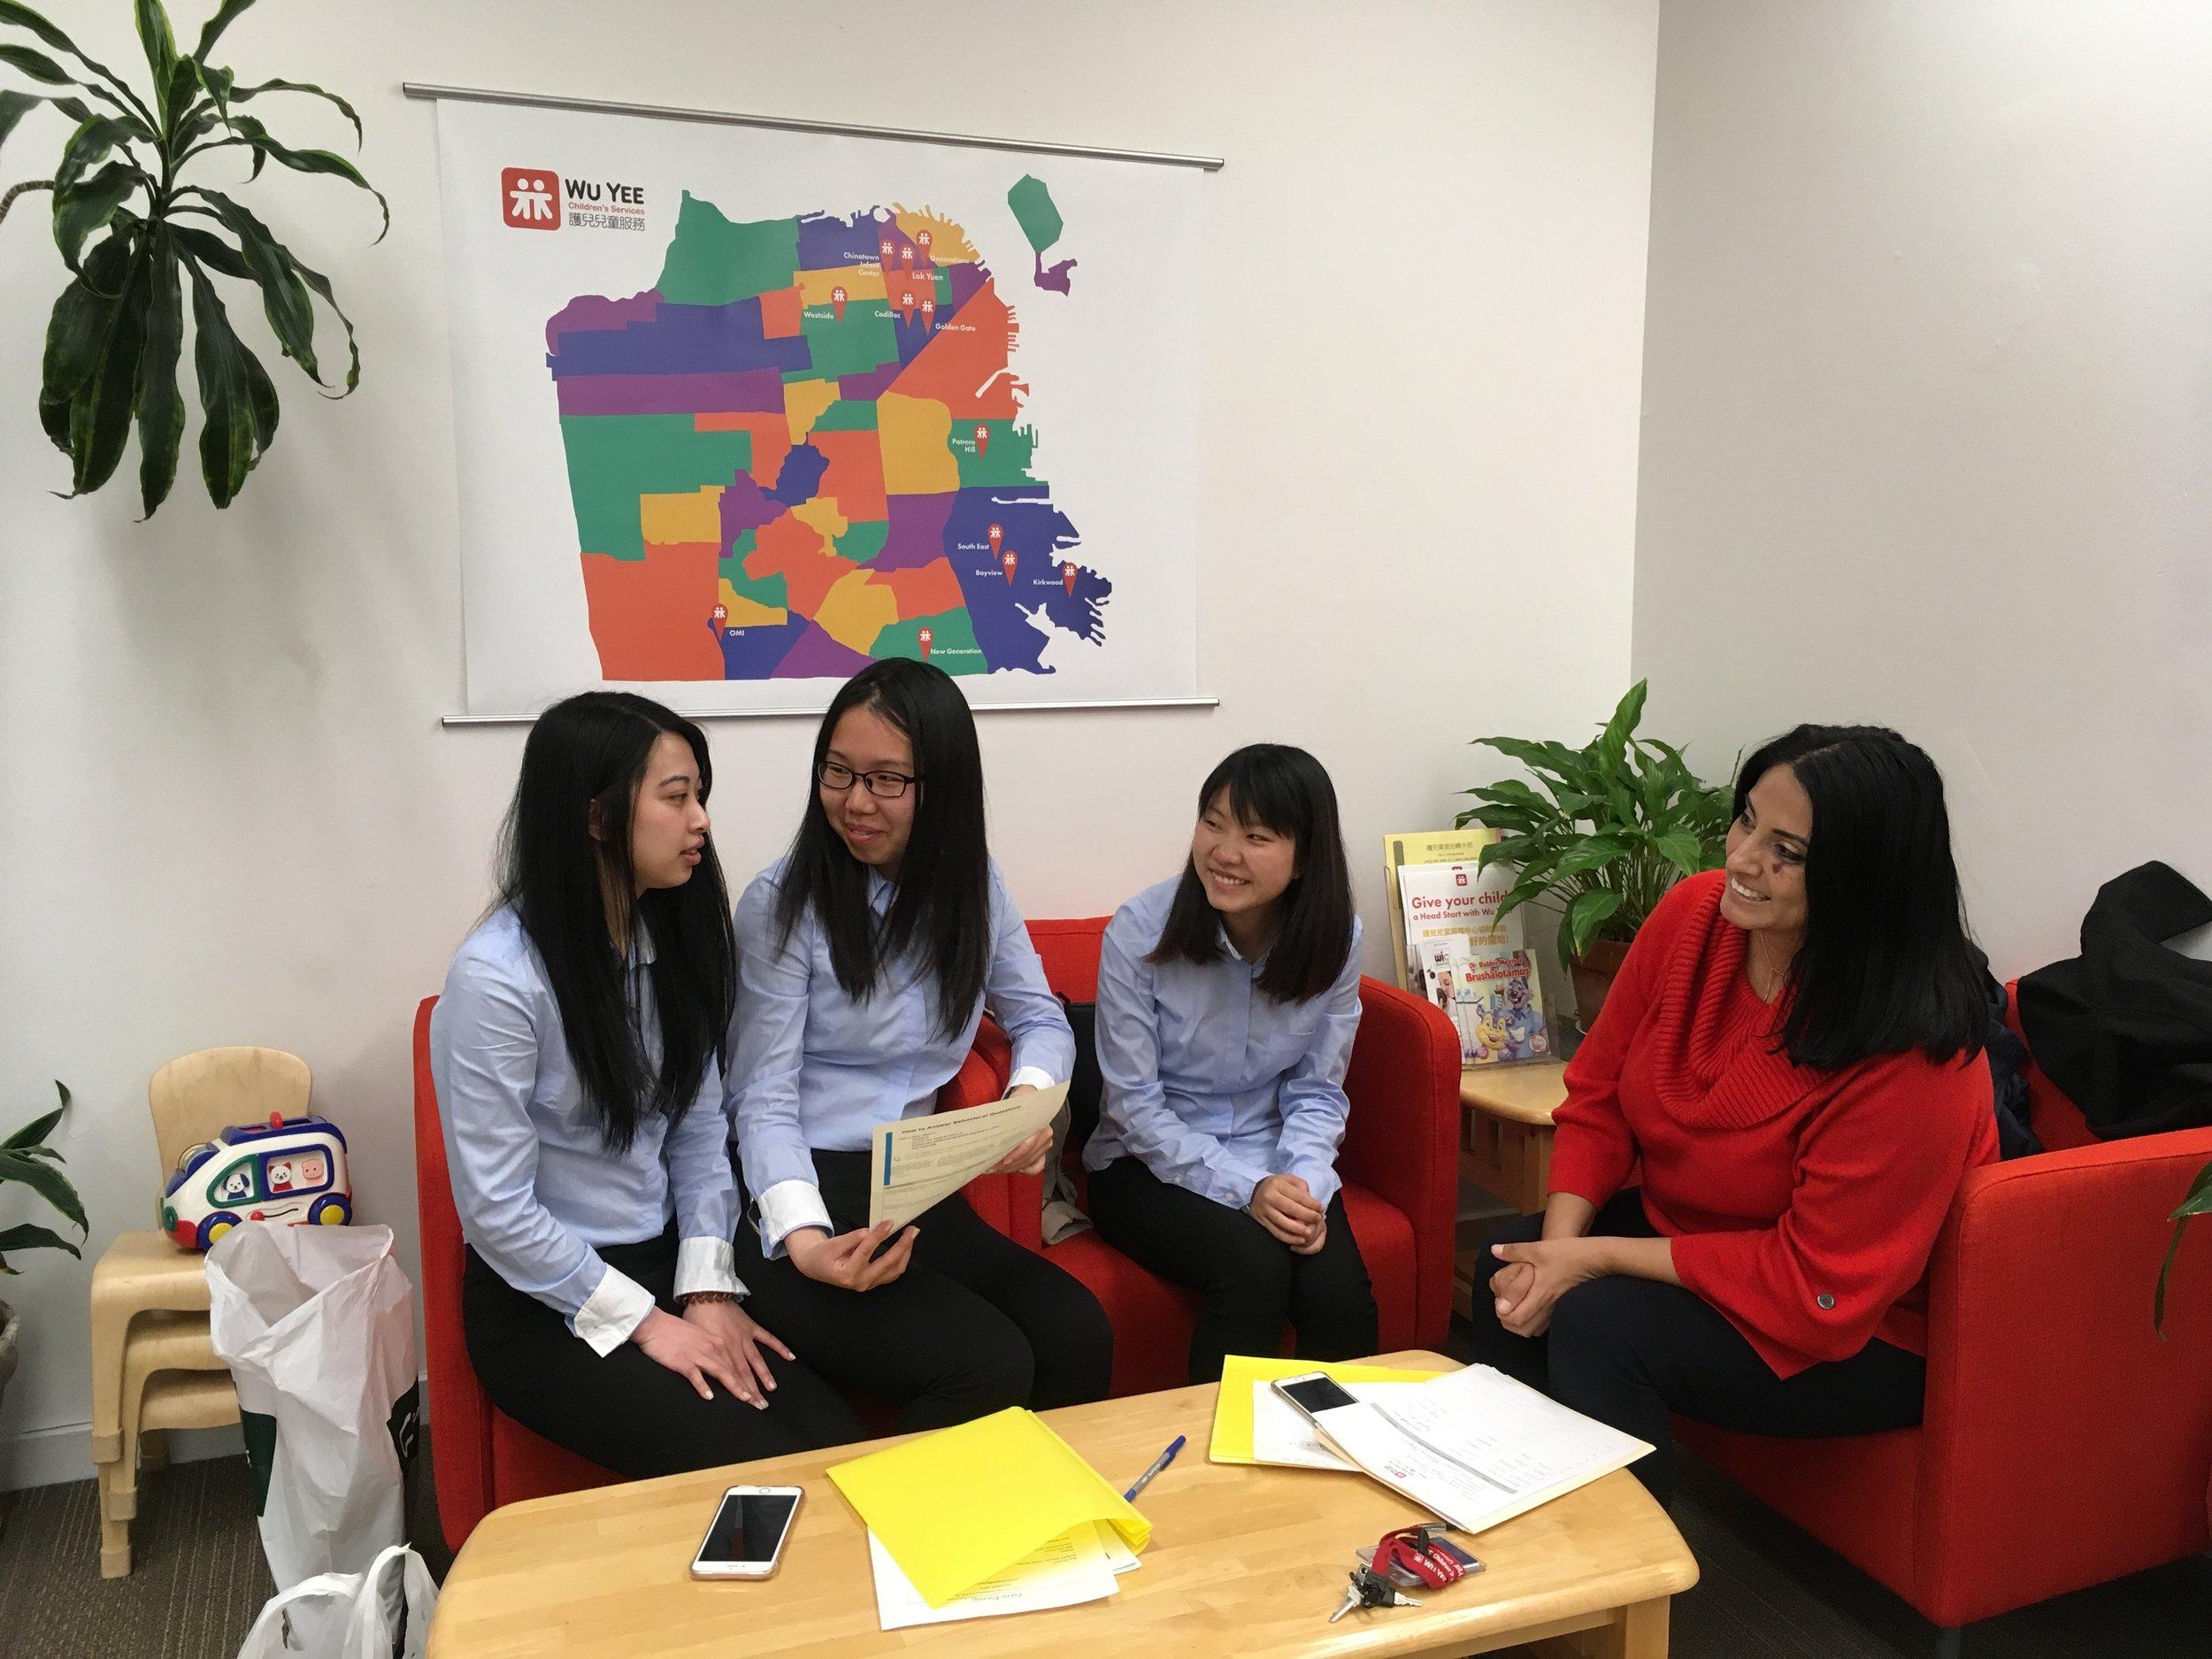 Prepping for ECE Career Pathway Program Practice Interviews